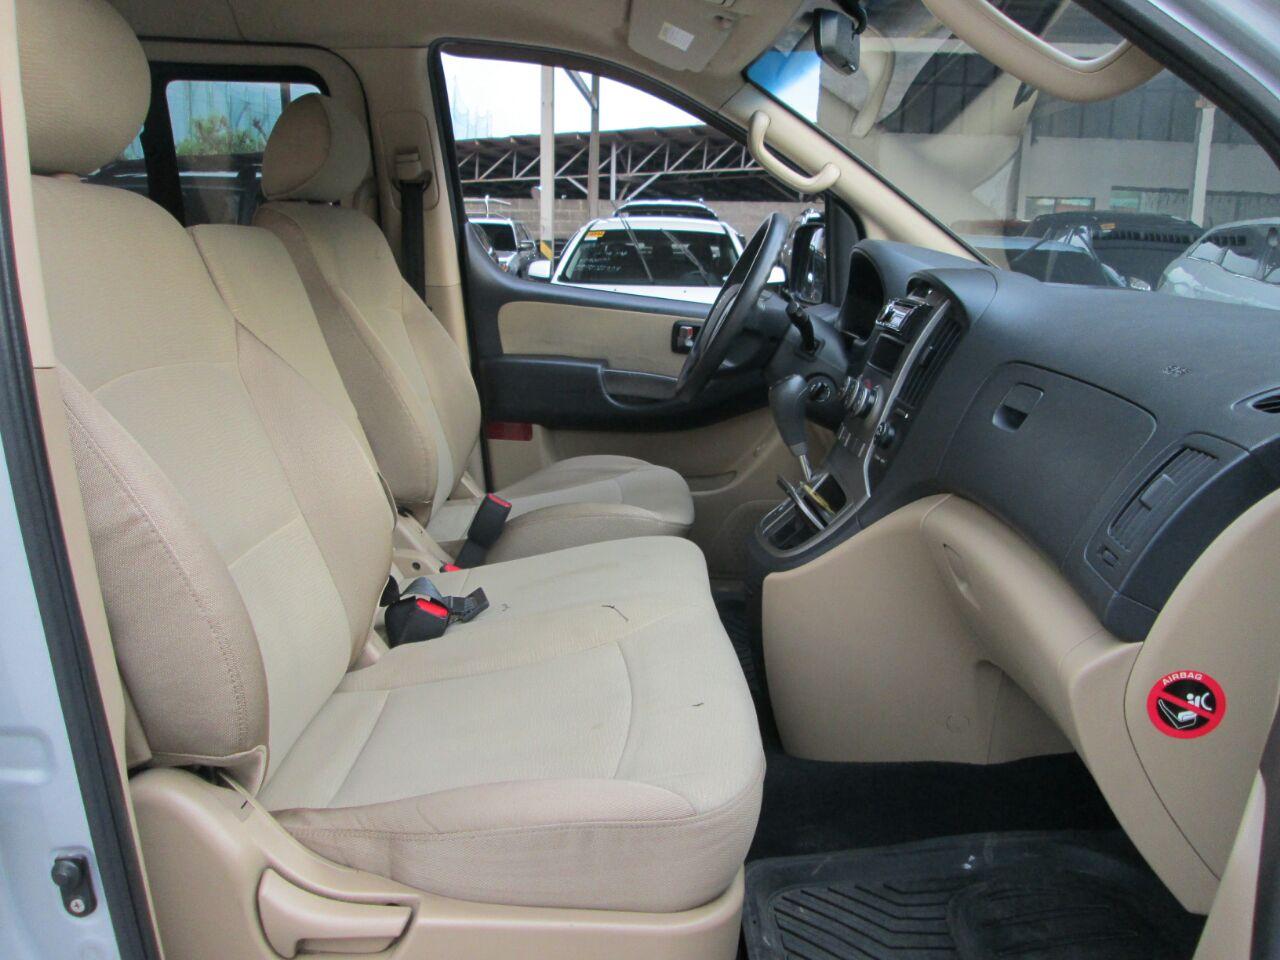 2008 Hyundai Grand Starex GLS CRDi VGT (10 Seats Swivel)